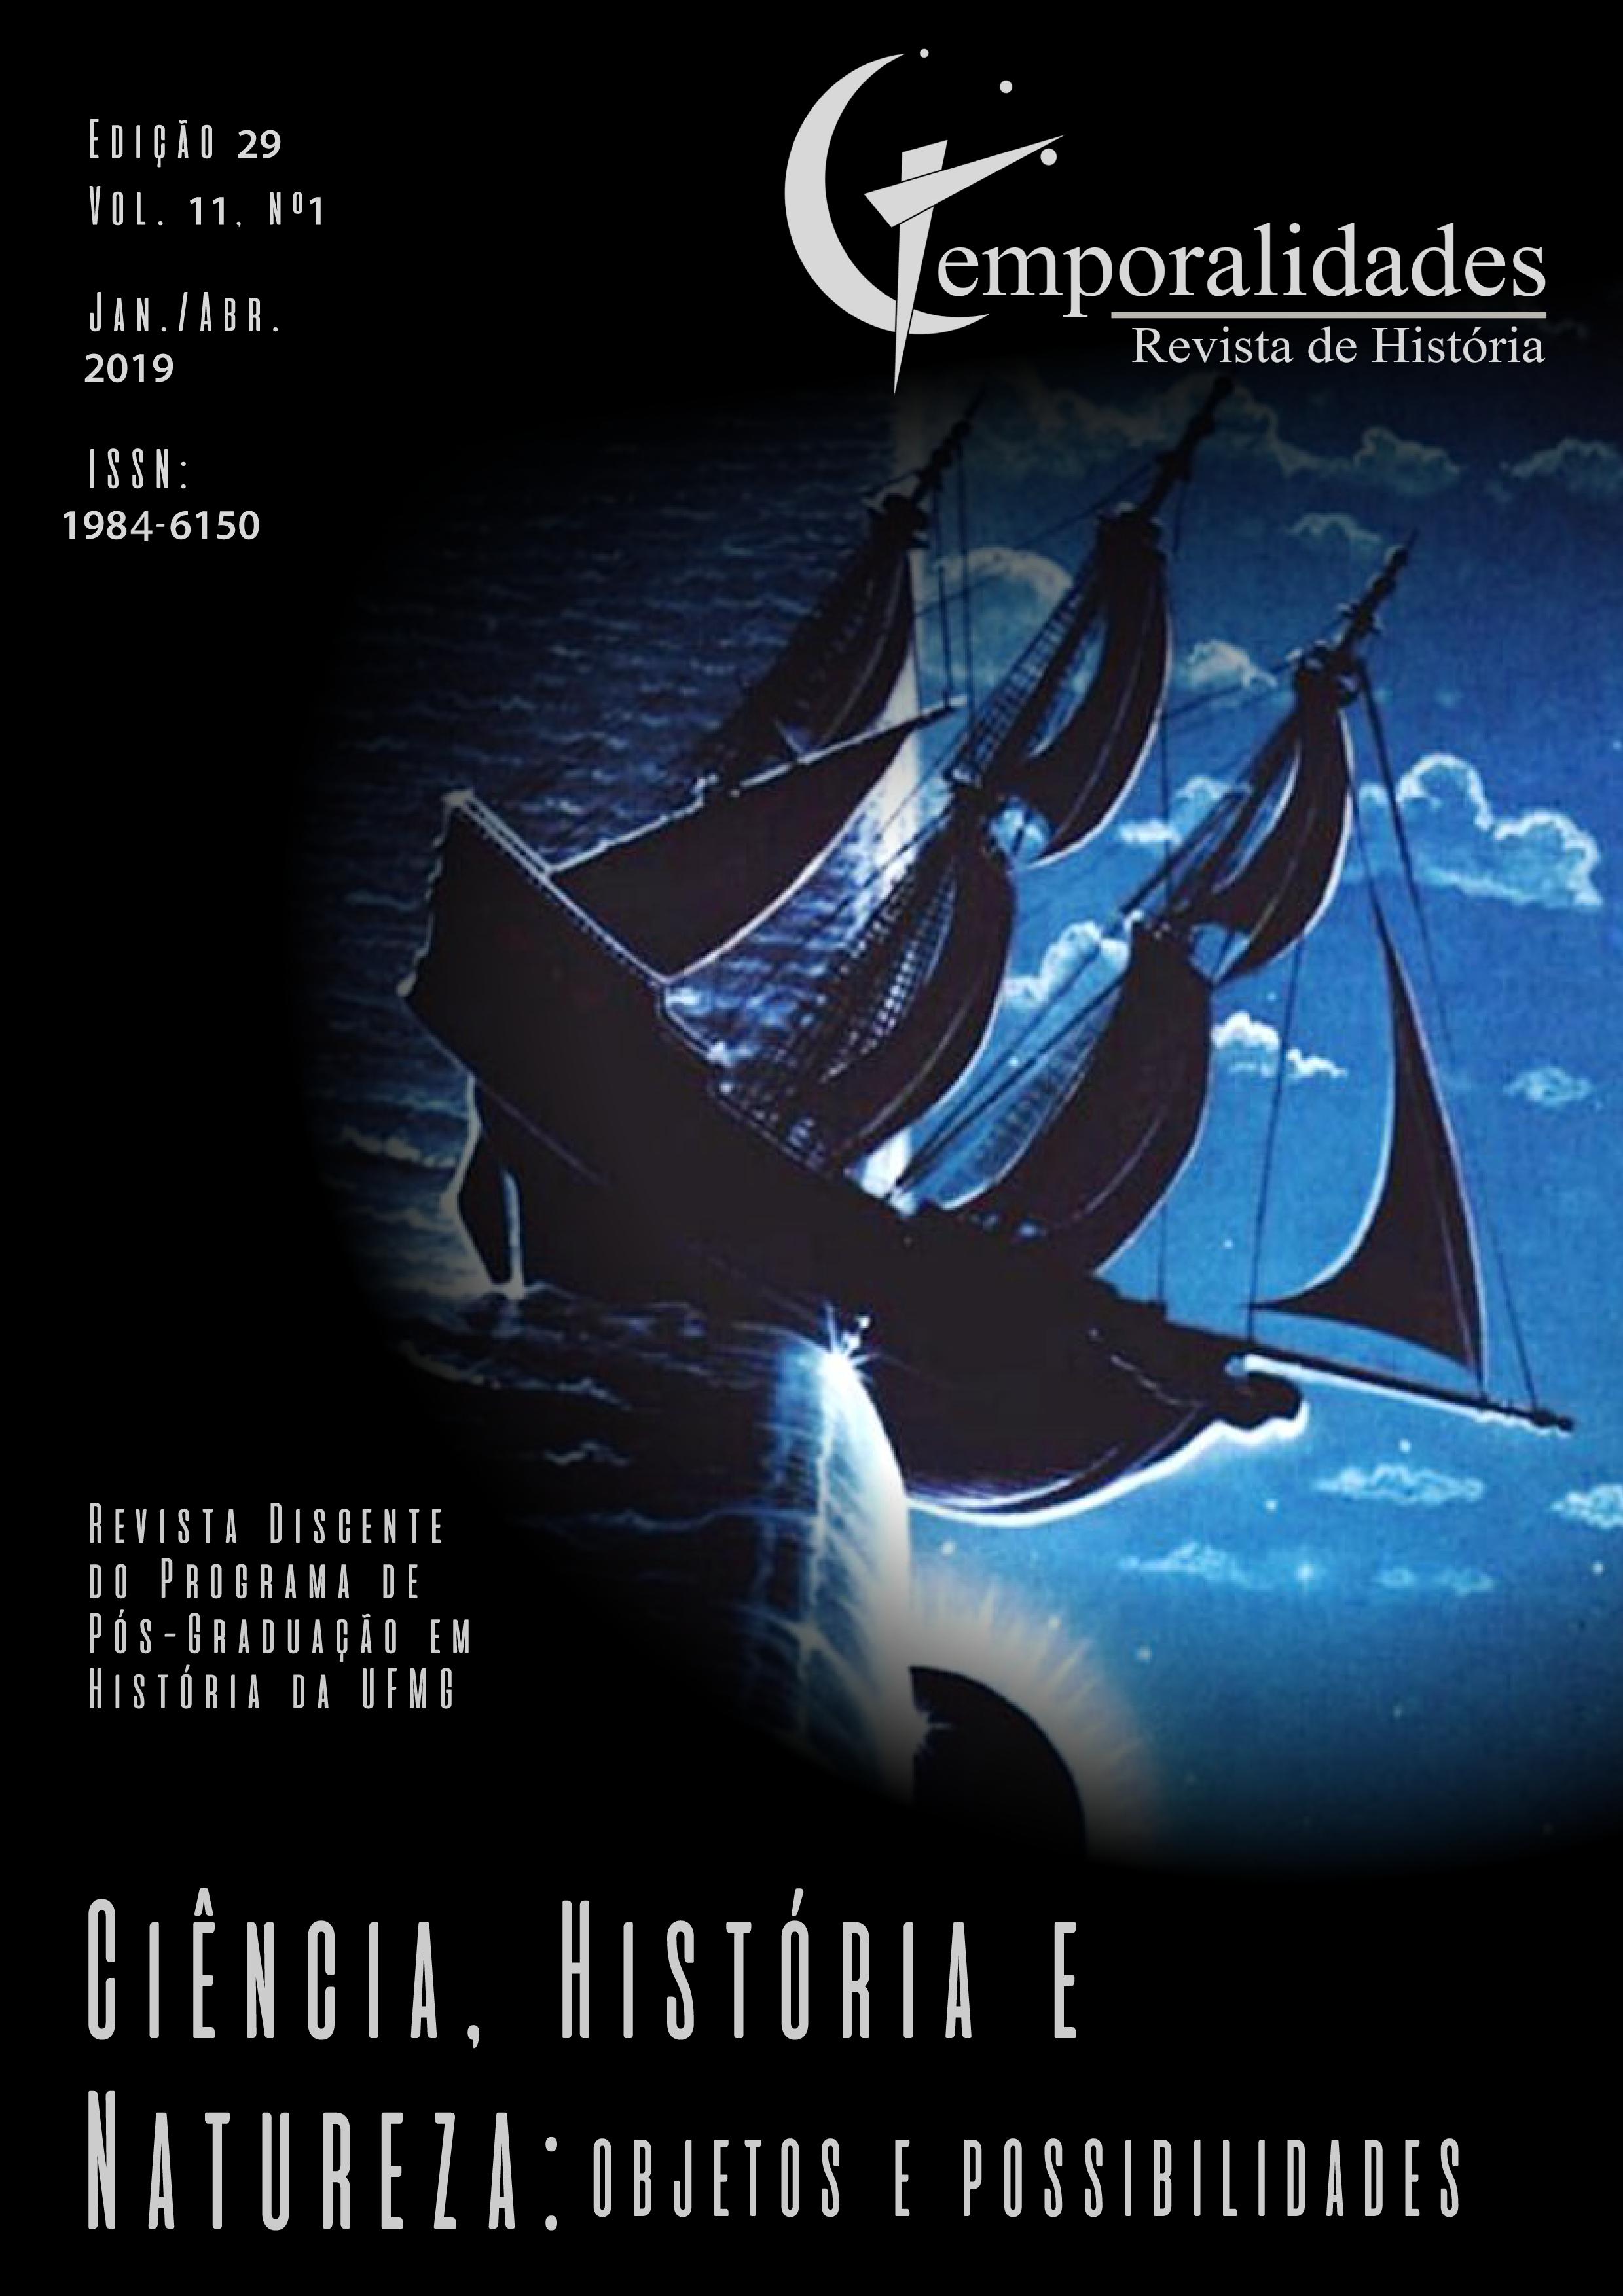 Visualizar v. 11 n. 1 (2019): Edição 29 - Temporalidades, Belo Horizonte, Vol. 11, n.1 (jan./abr. 2019)